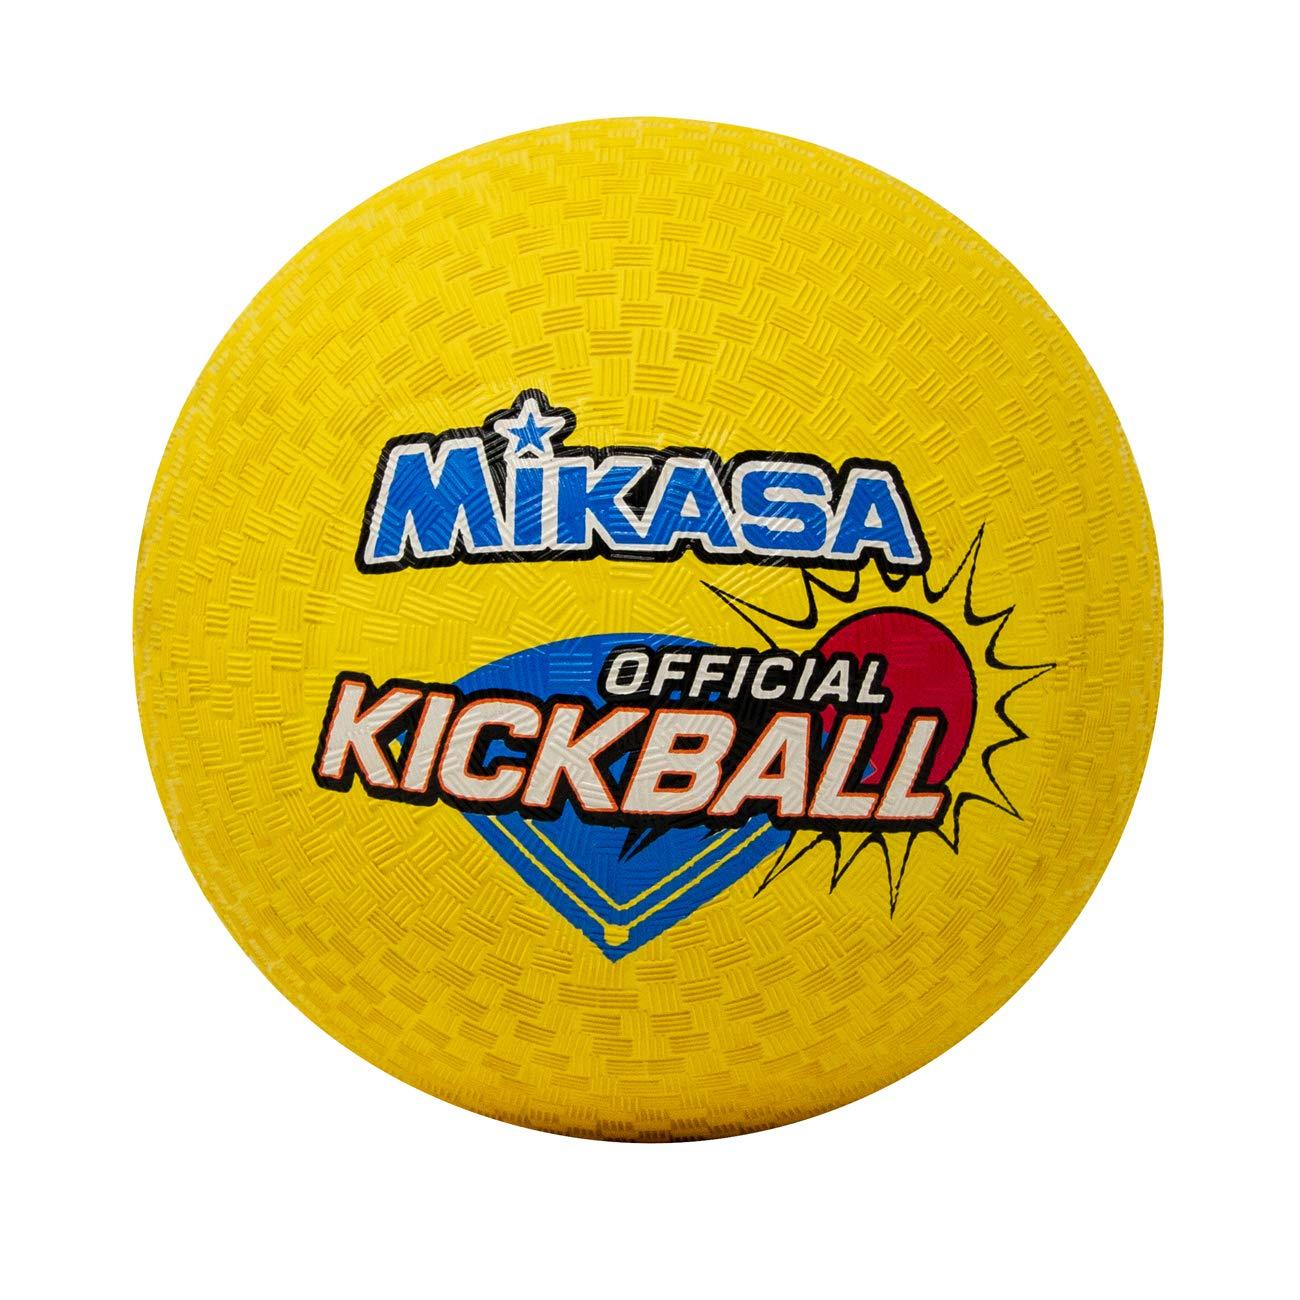 Mikasa Kick Ball (Jaune, 21,6cm) 6cm) DP850